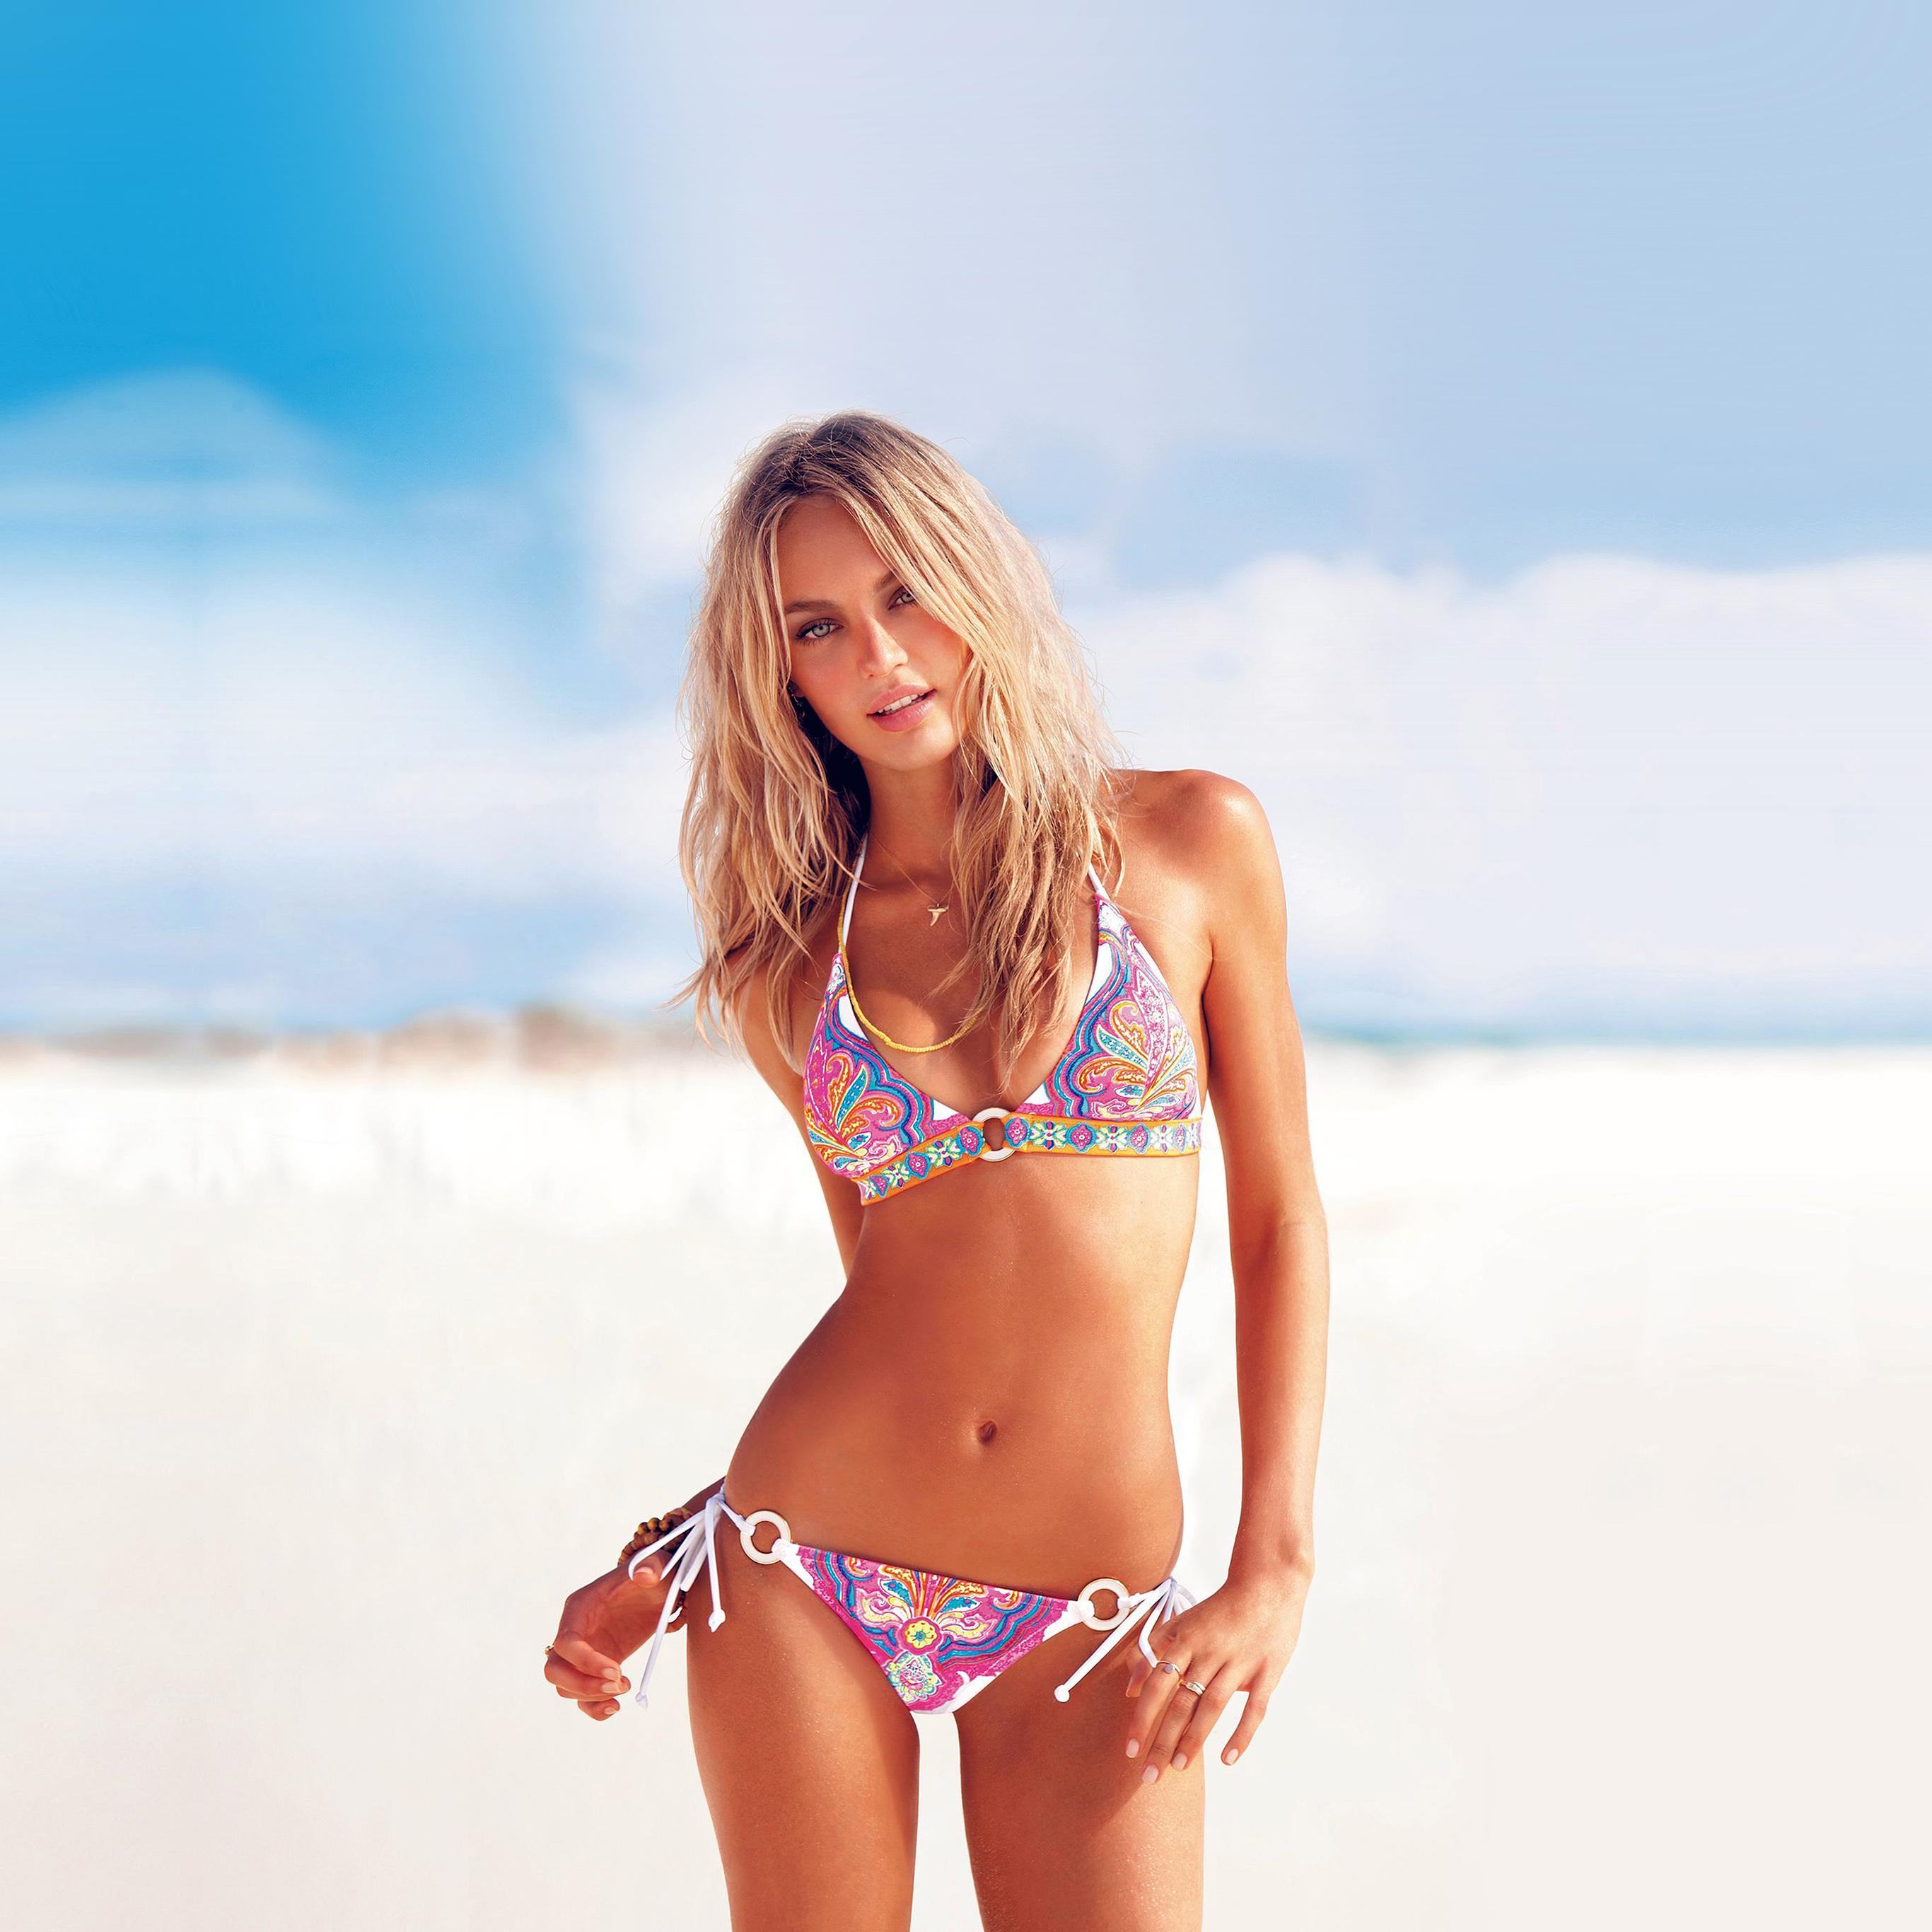 hh14 victoria secret model beach bikini summer. Black Bedroom Furniture Sets. Home Design Ideas